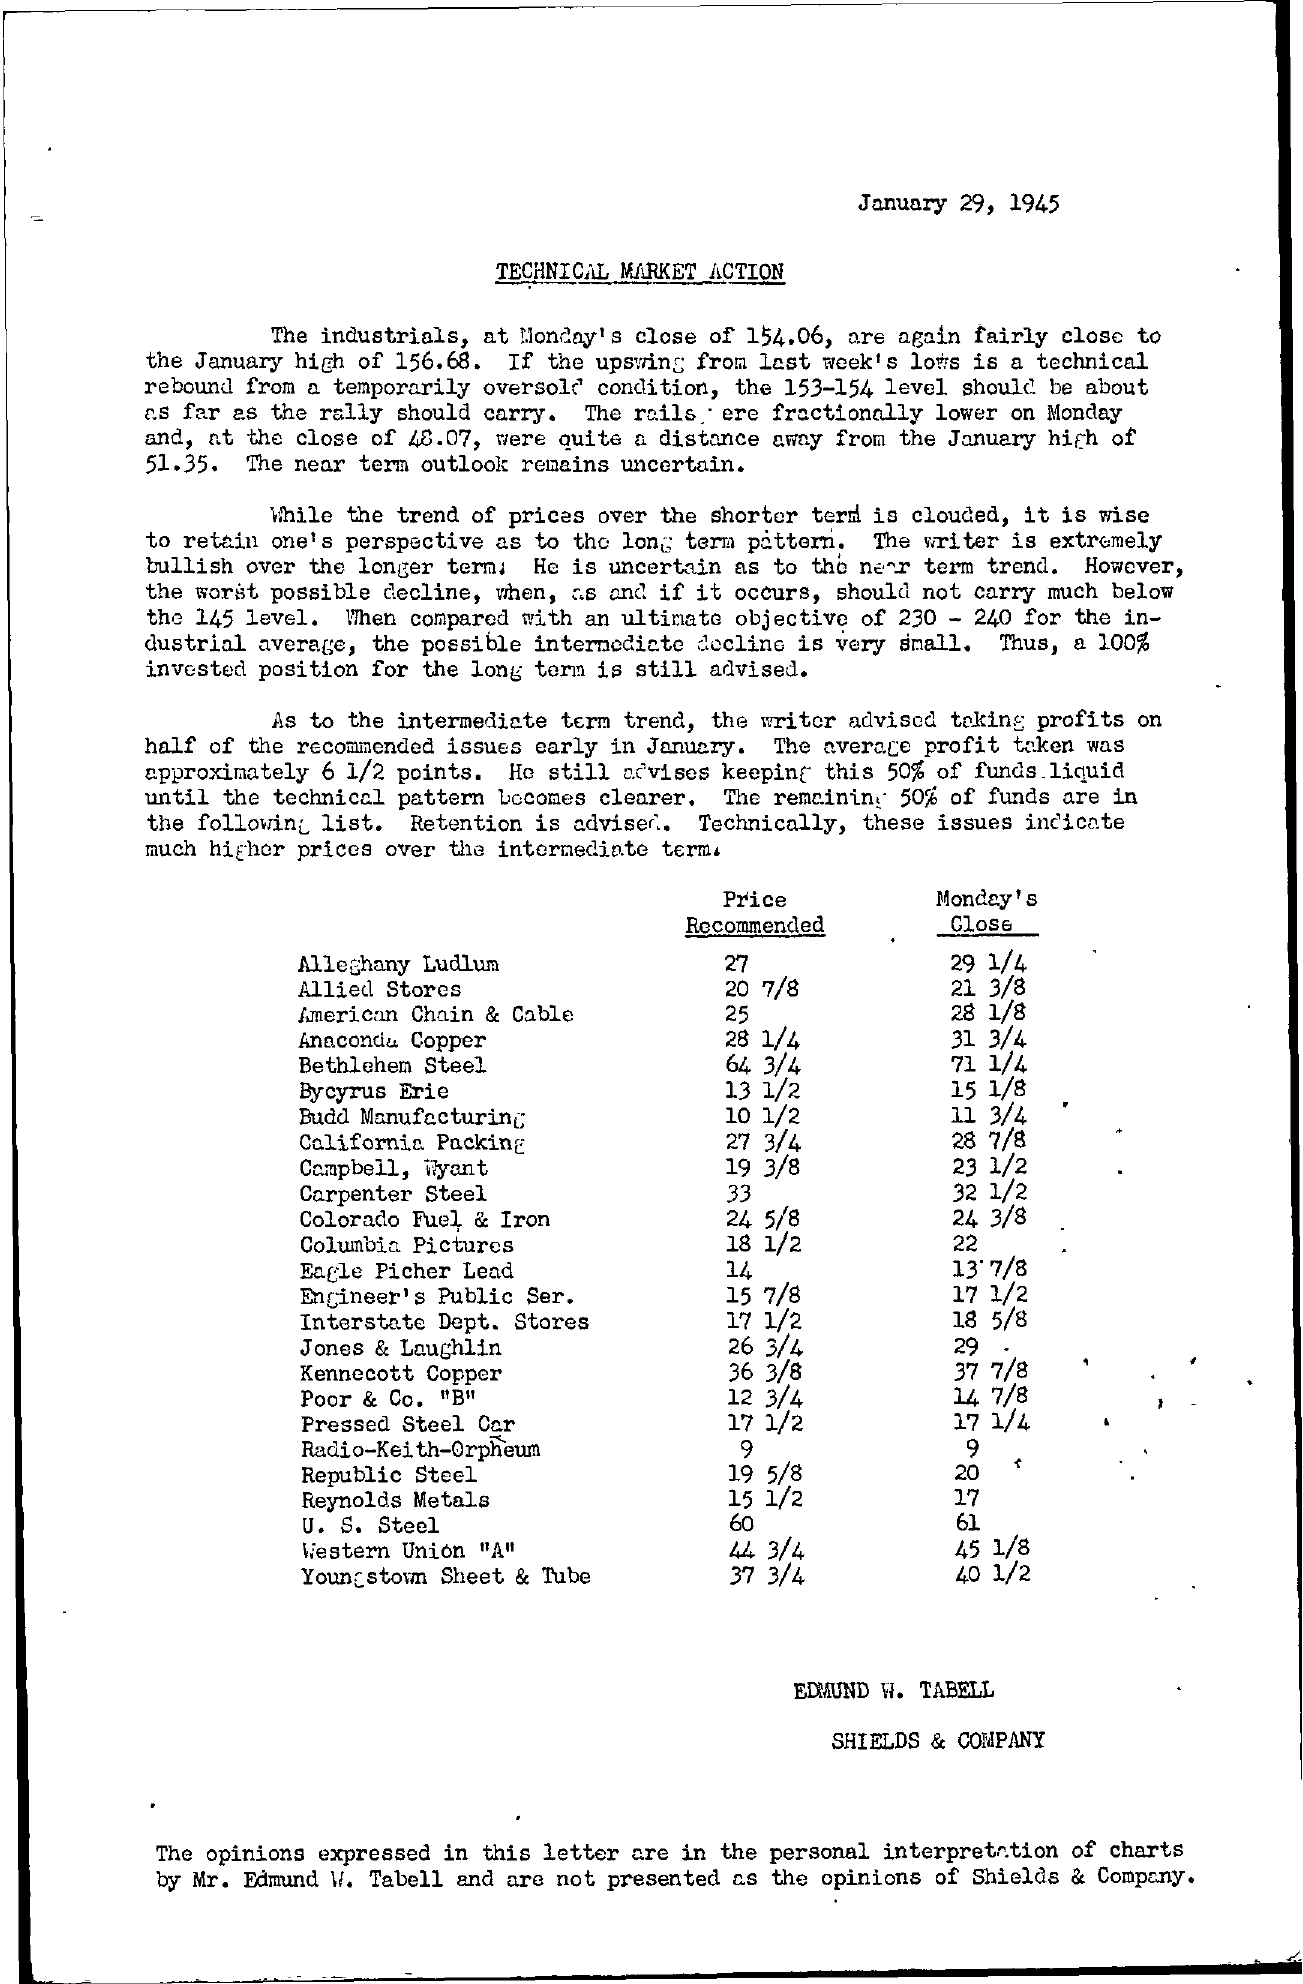 Tabell's Market Letter - January 29, 1945